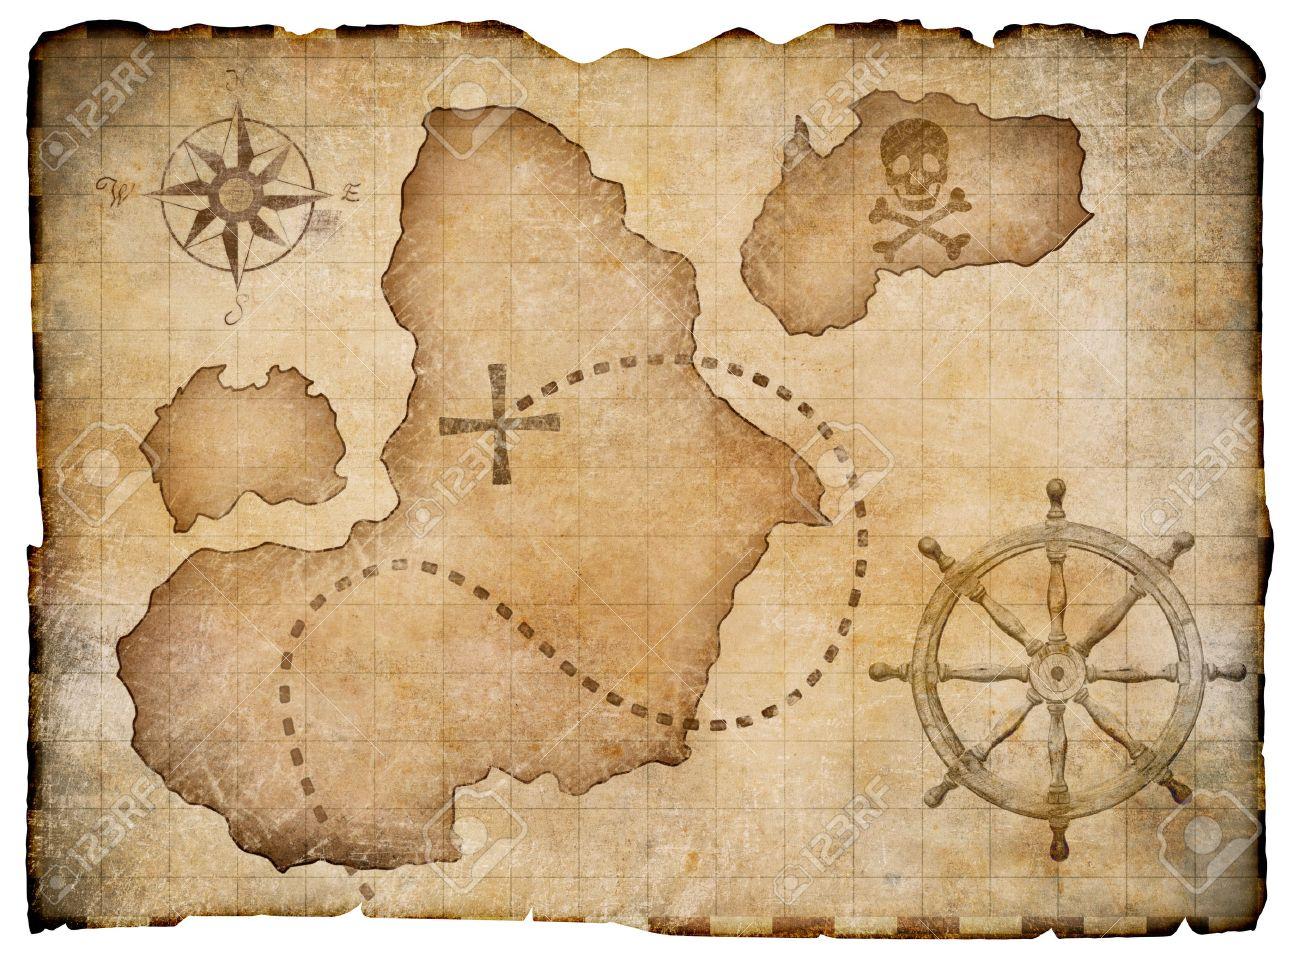 Carte Au Tresor Pirate.Vieux Parchemin Pirates Carte Au Tresor Isole Chemin De Detourage Inclus